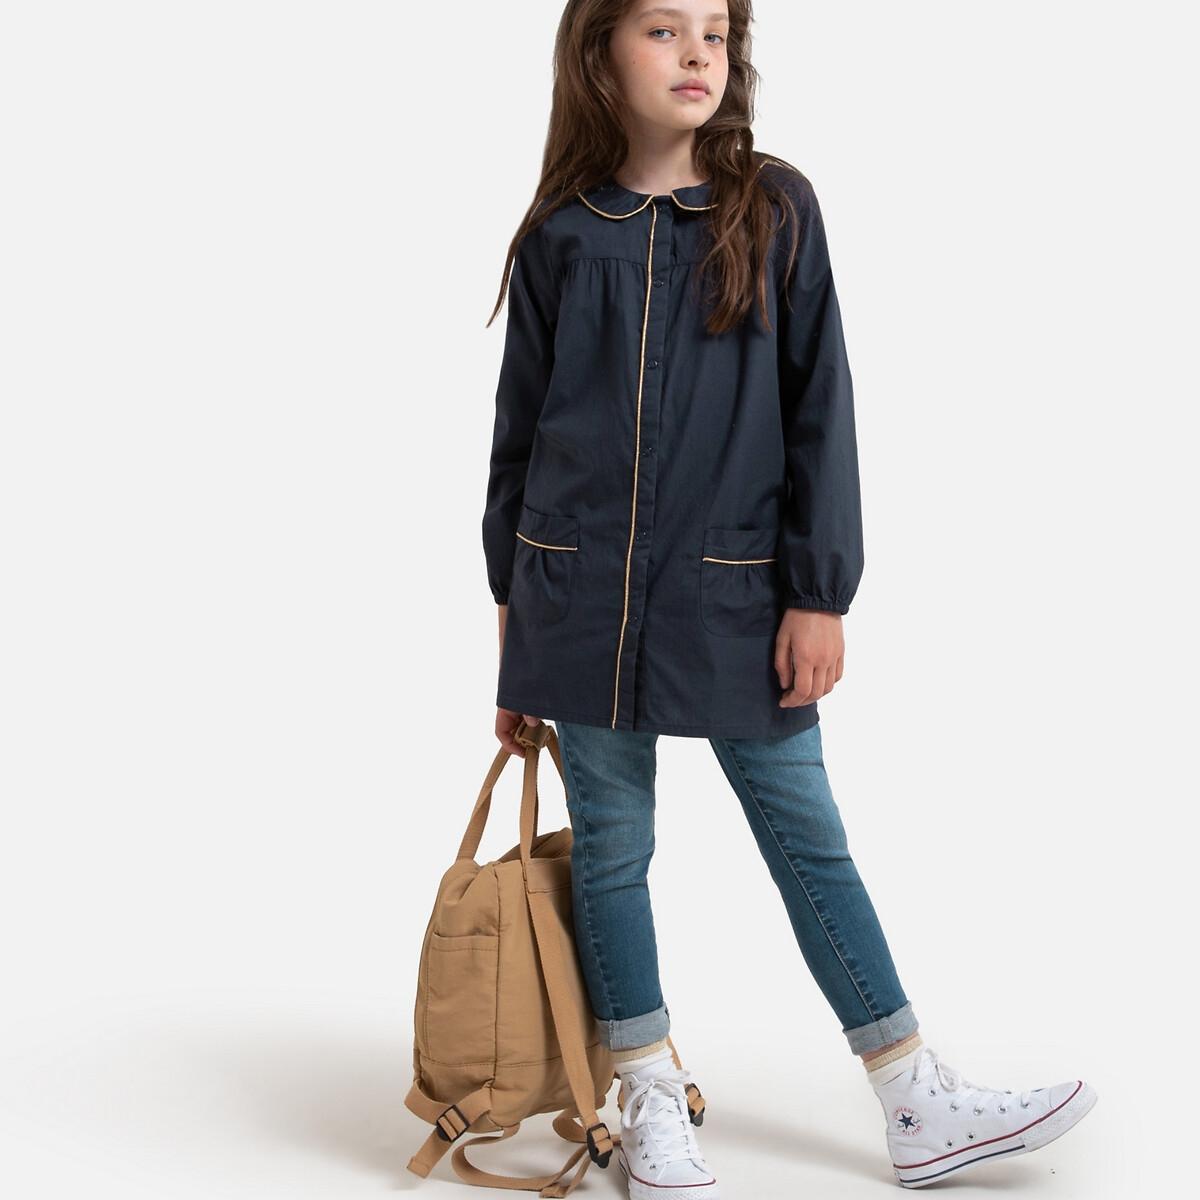 Фото - Блуза LaRedoute С длинными рукавами 3-12 лет 8 лет - 126 см синий рубашка laredoute джинсовая 3 12 лет 8 лет 126 см синий